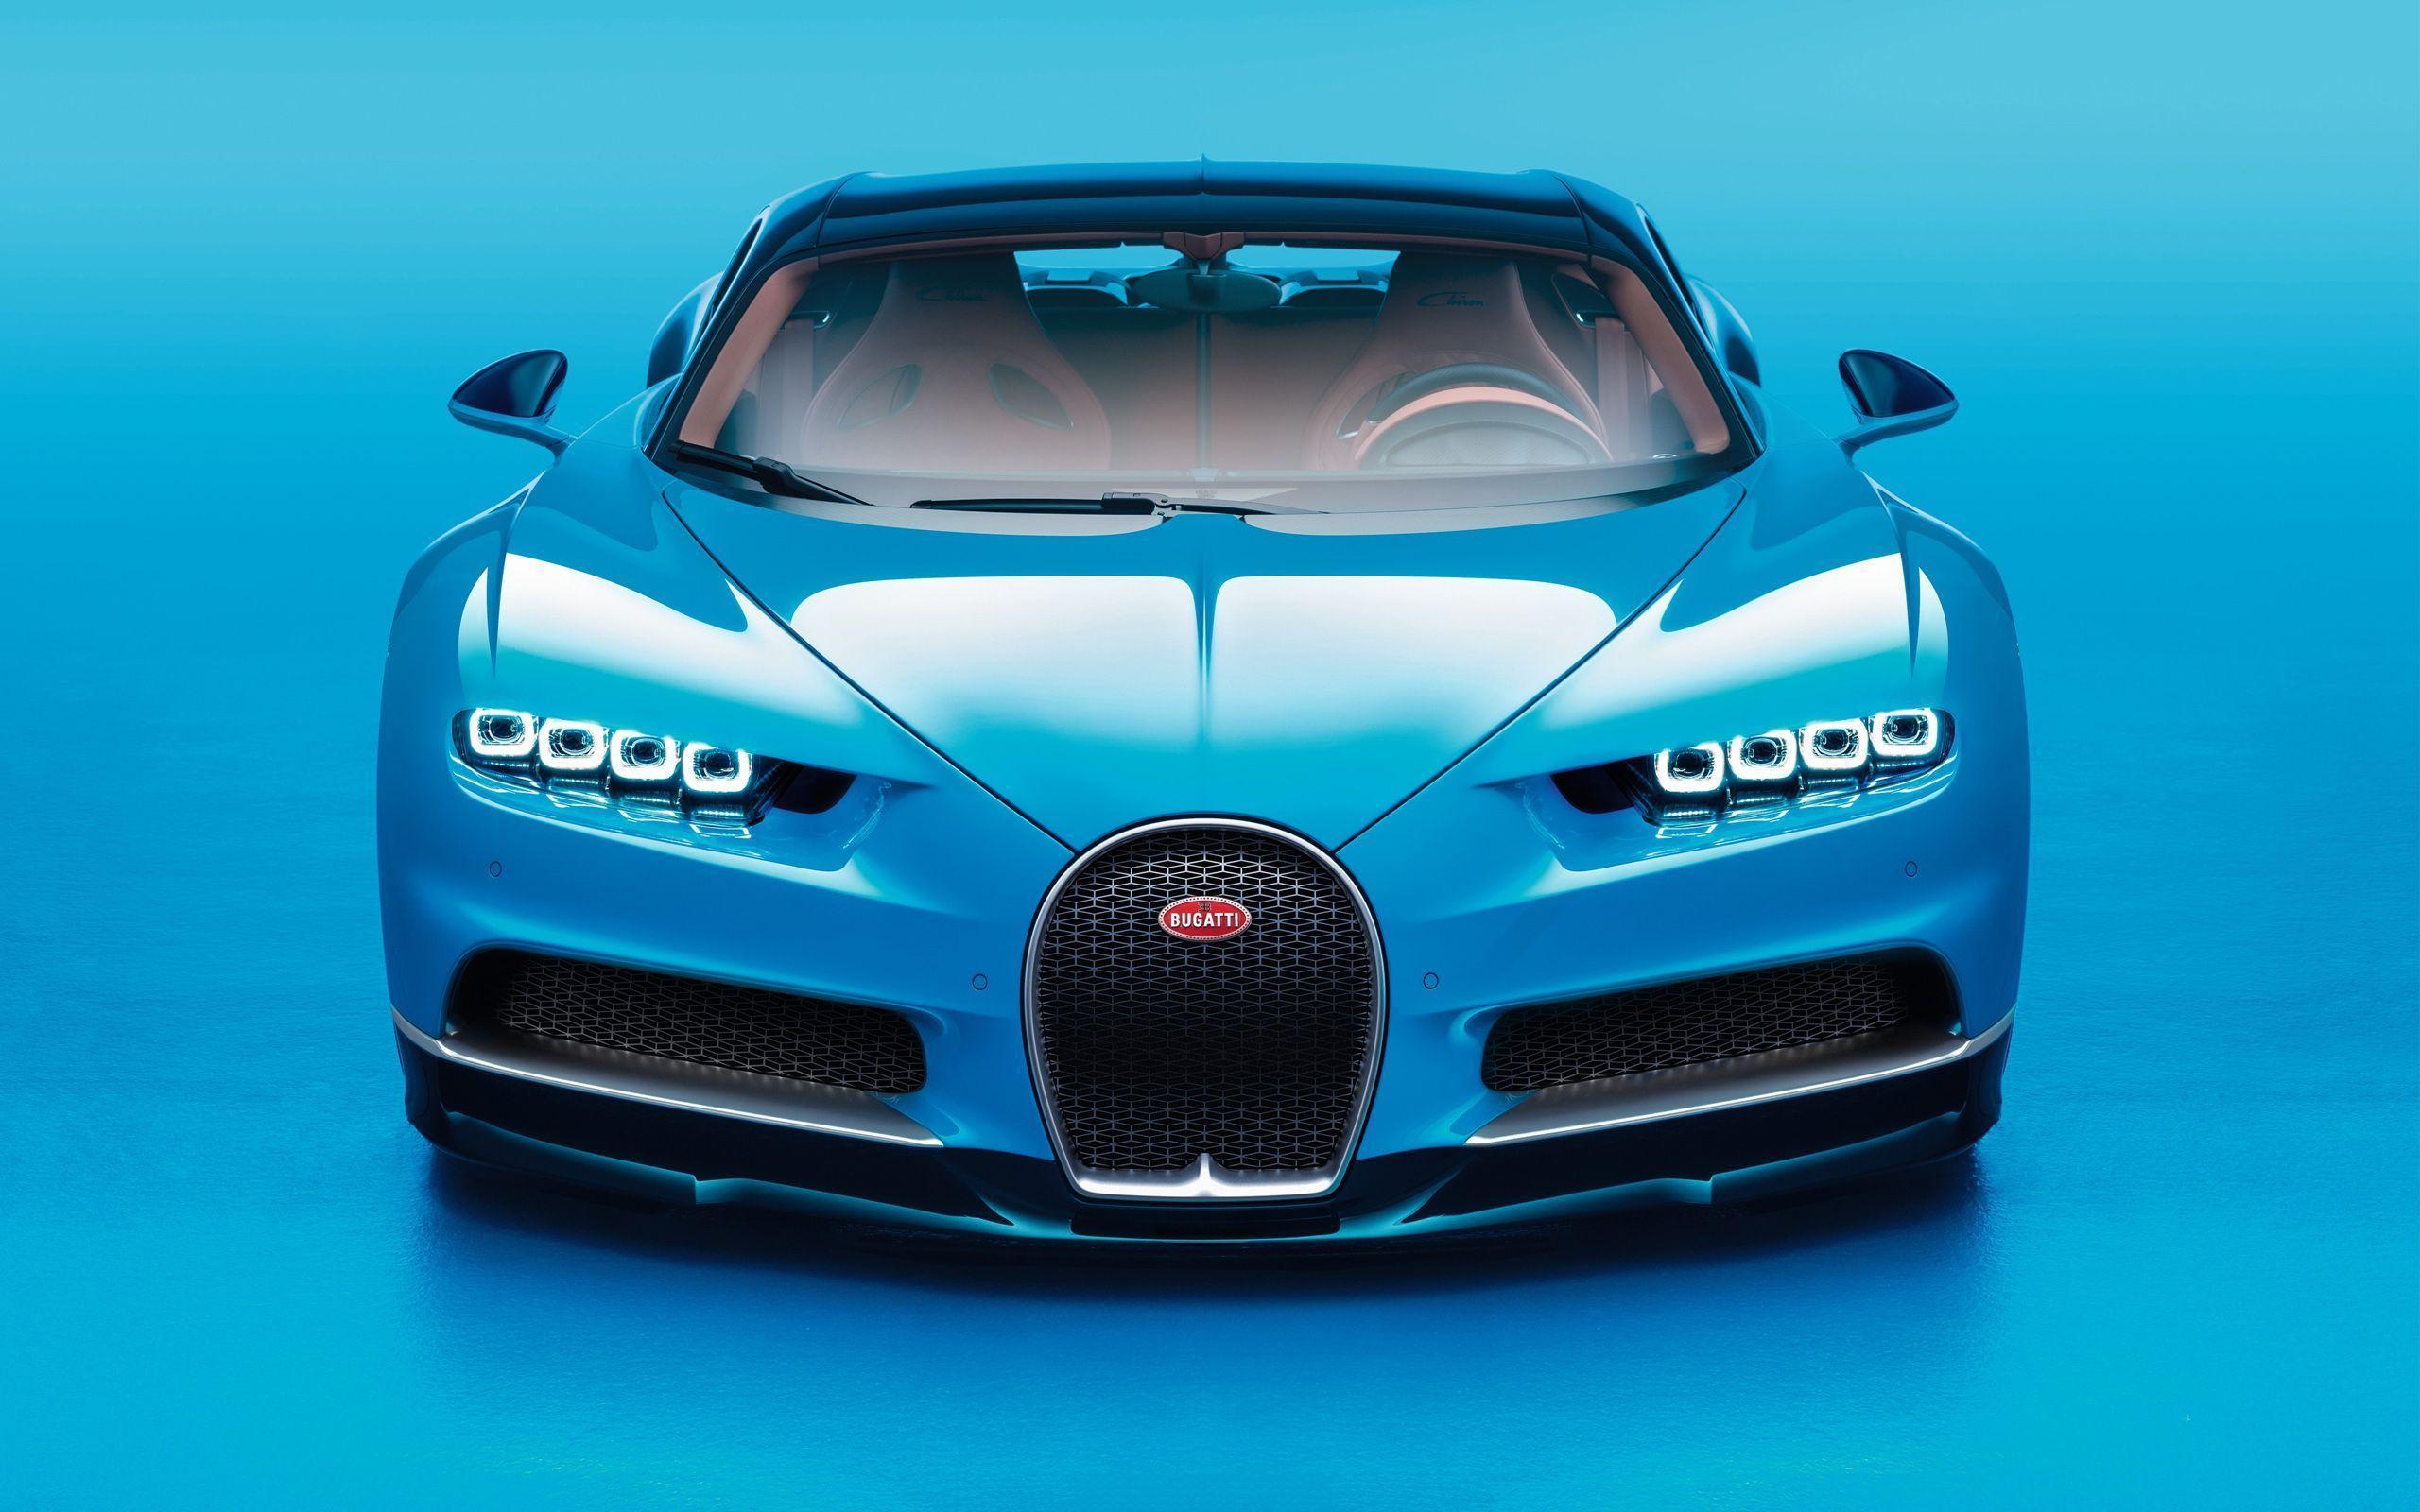 Bugatti Chiron Desktop Backgrounds, Download Free HD Wallpapers